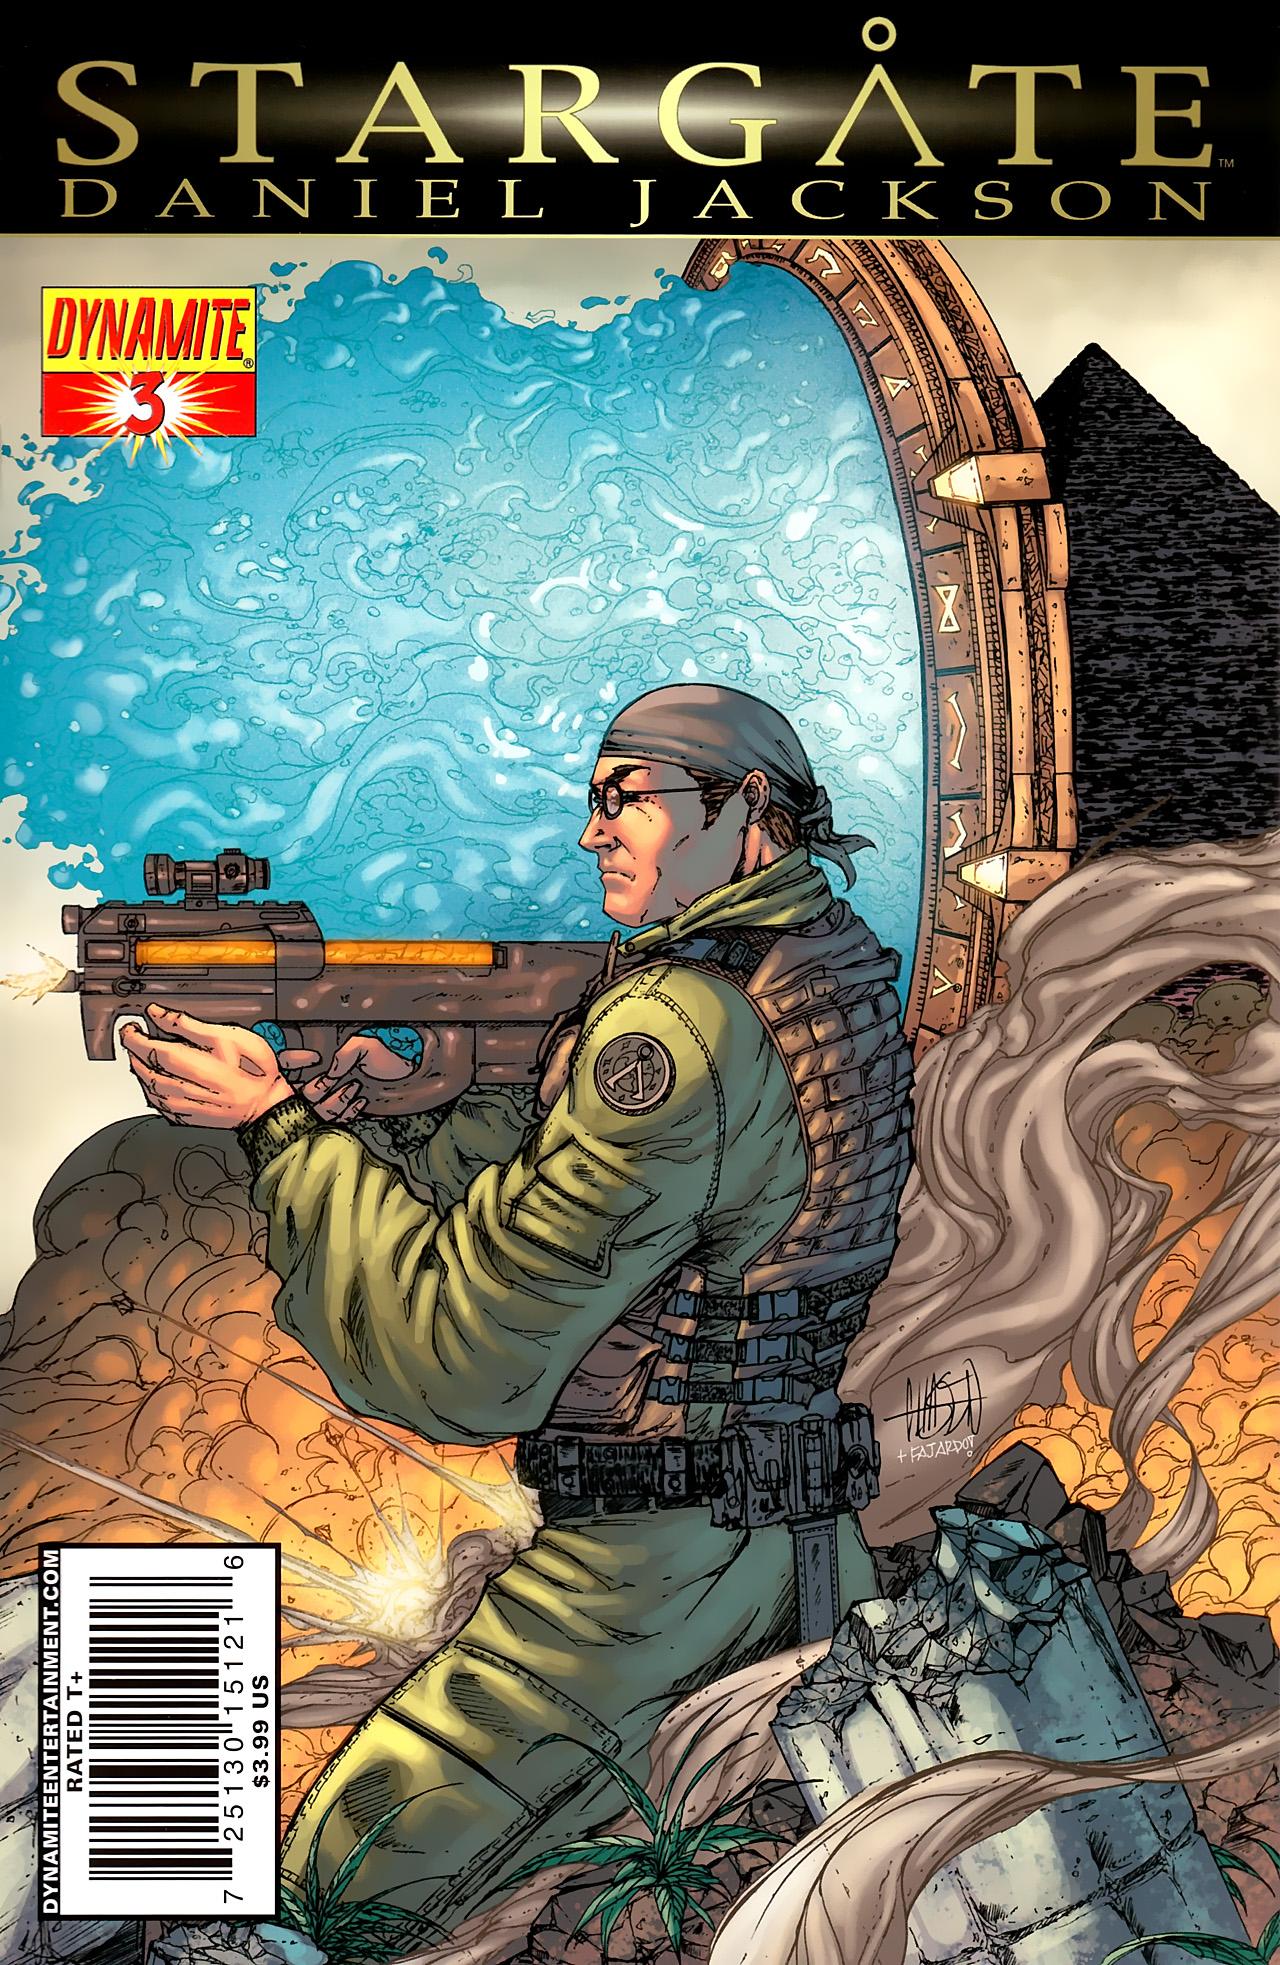 Read online Stargate: Daniel Jackson comic -  Issue #3 - 1